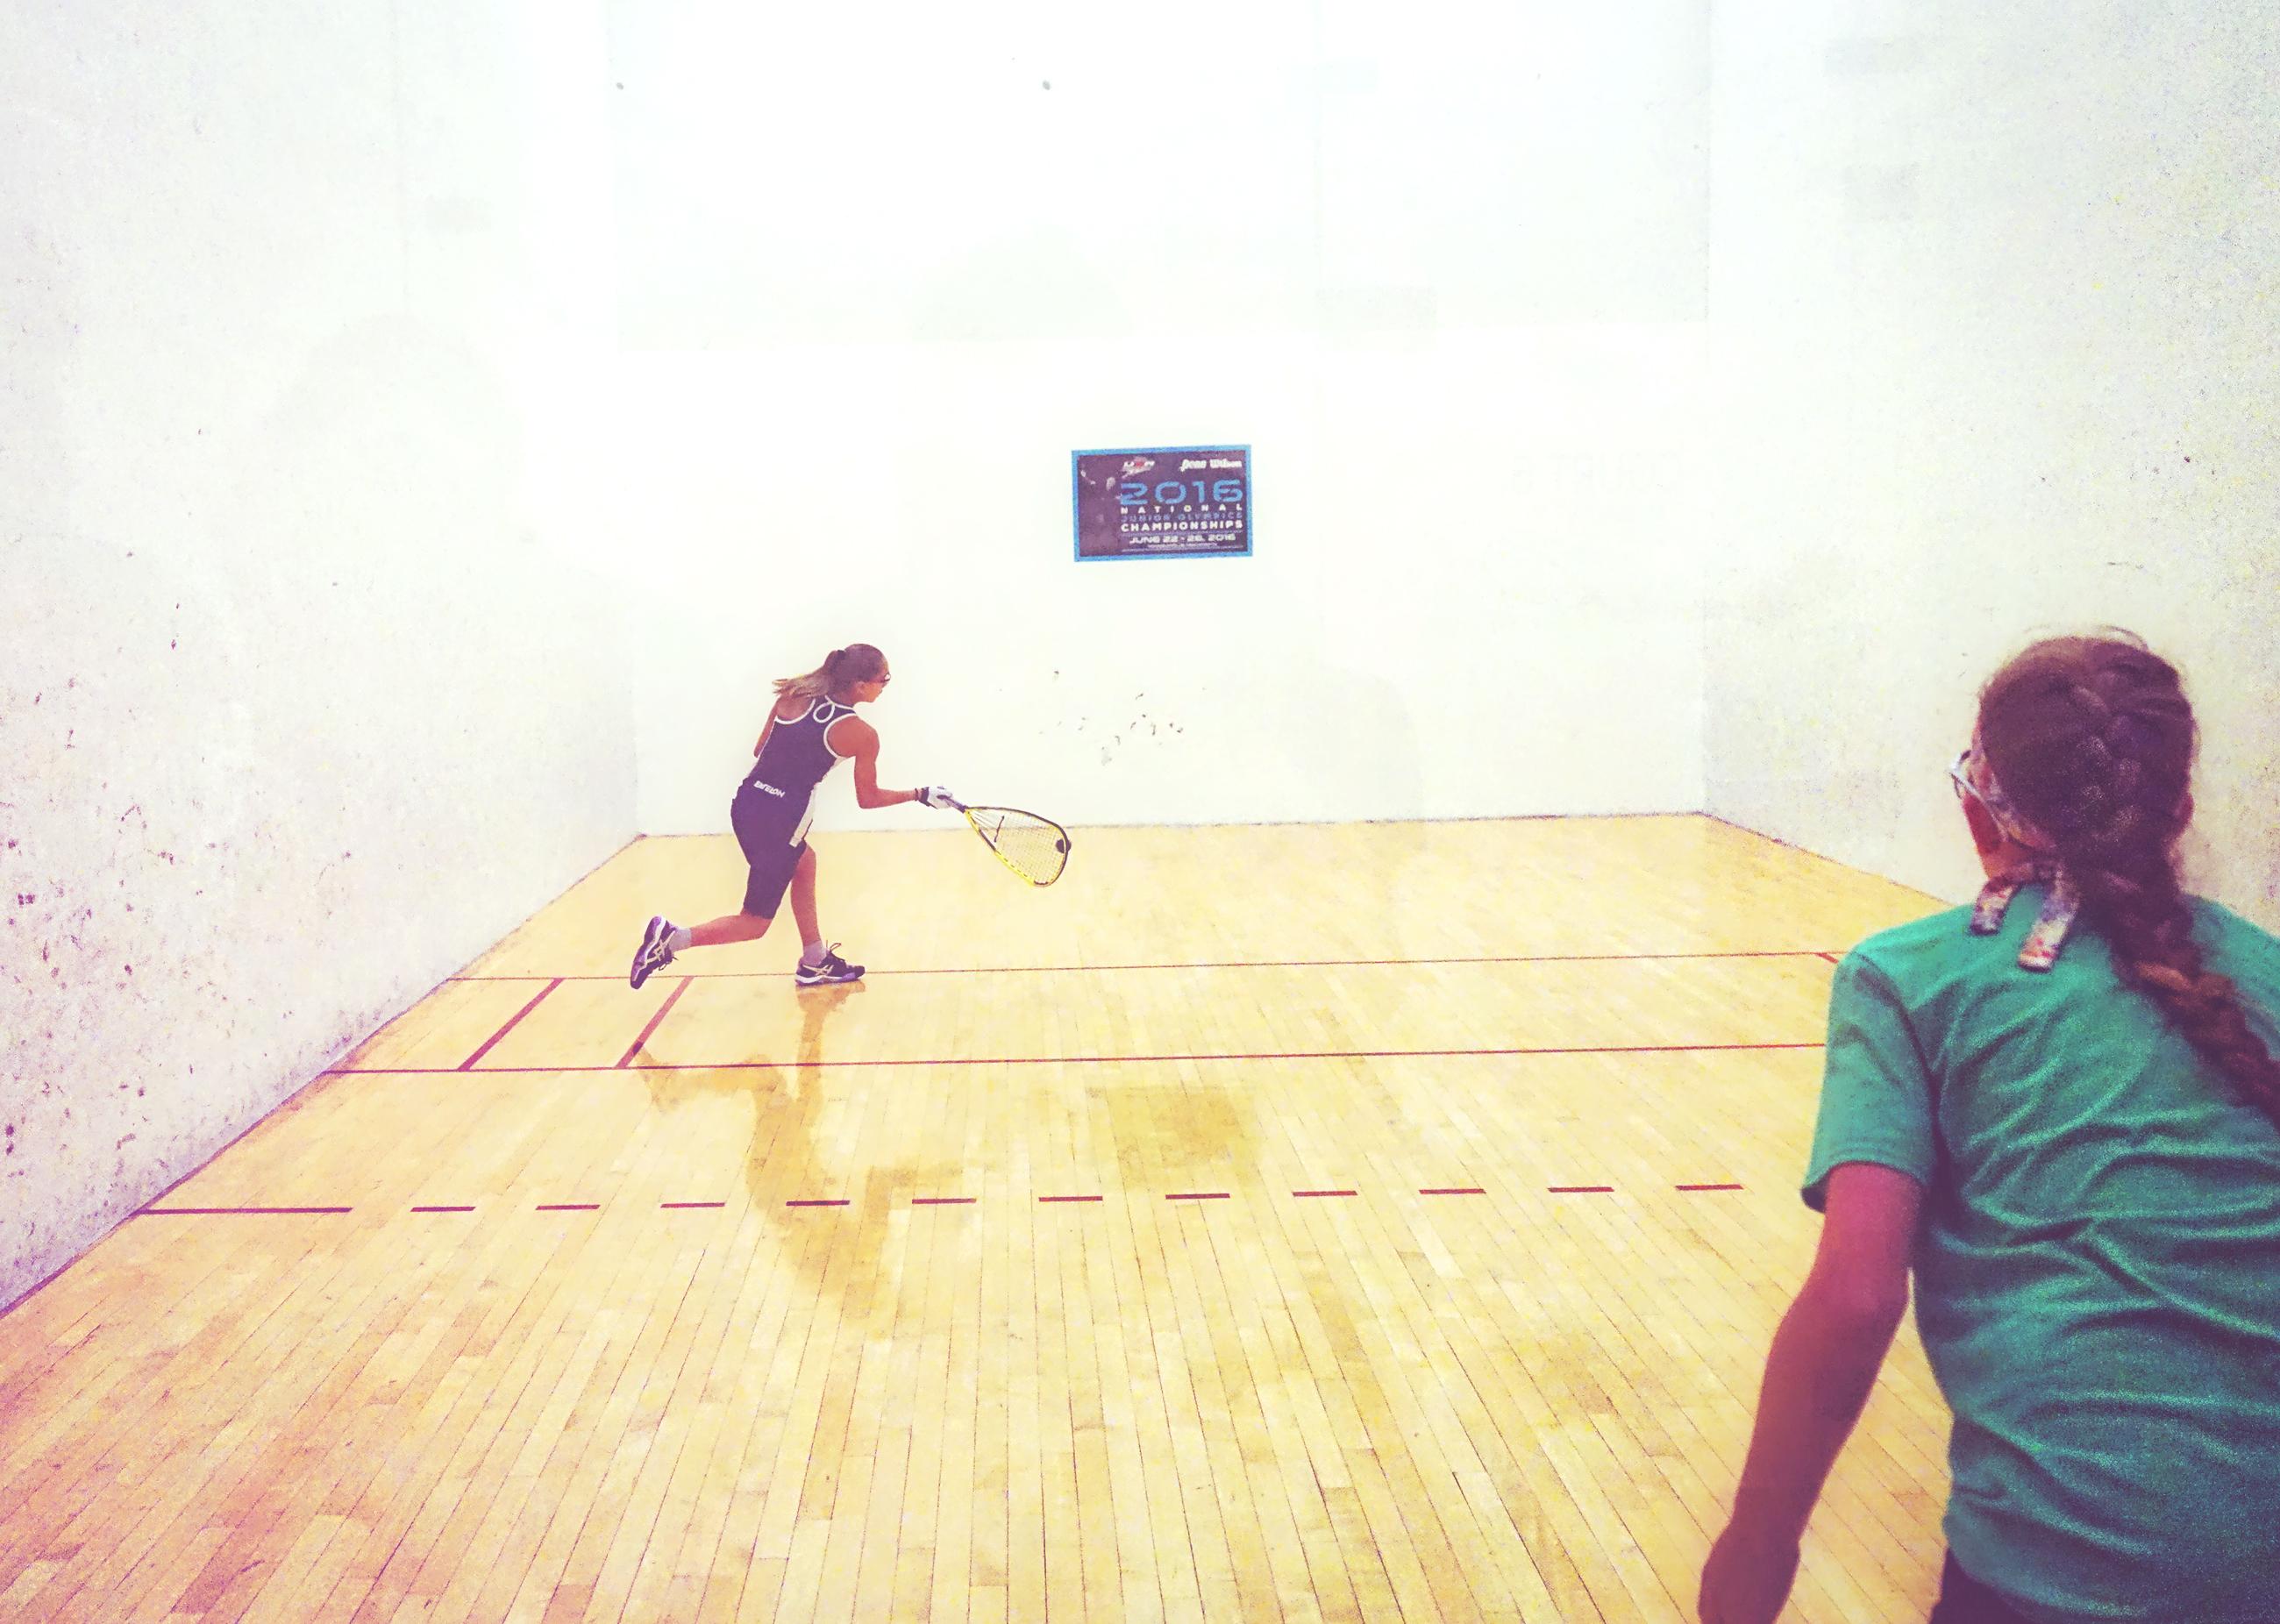 Women playing racquetball